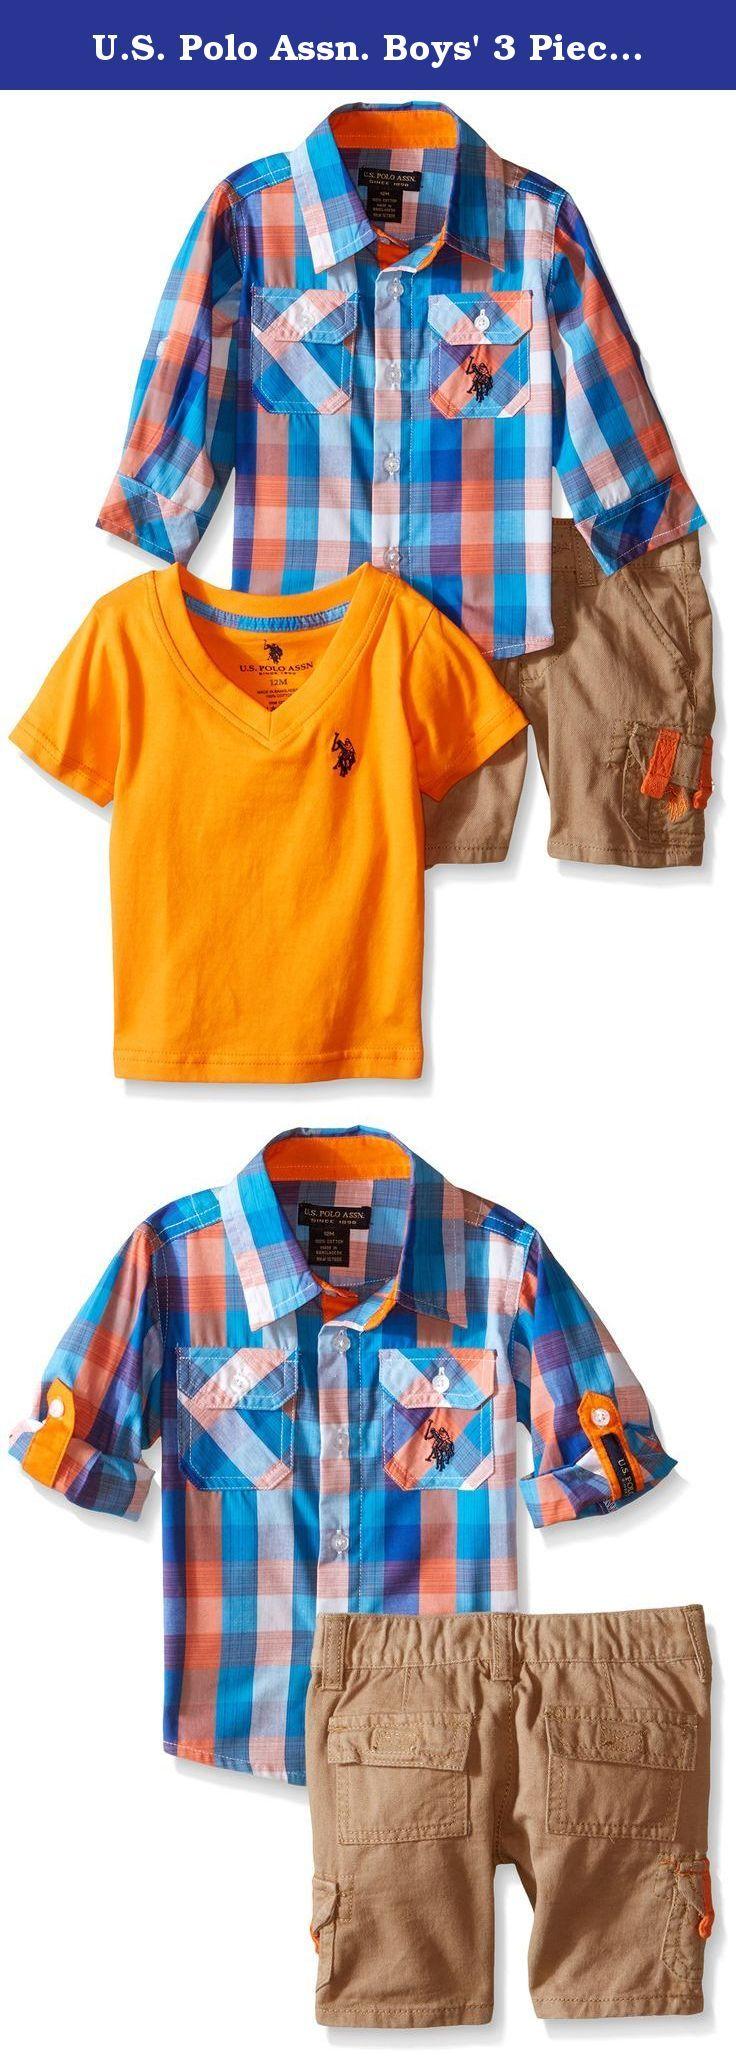 U.S. Polo Assn. Boys' 3 Piece Sport Shirt, V-Neck T-Shirt and Twill Cargo Short, Multi Plaid, 18 Months. Long sleeve plaid sport shirt, v-neck t-shirt and twill cargo short.